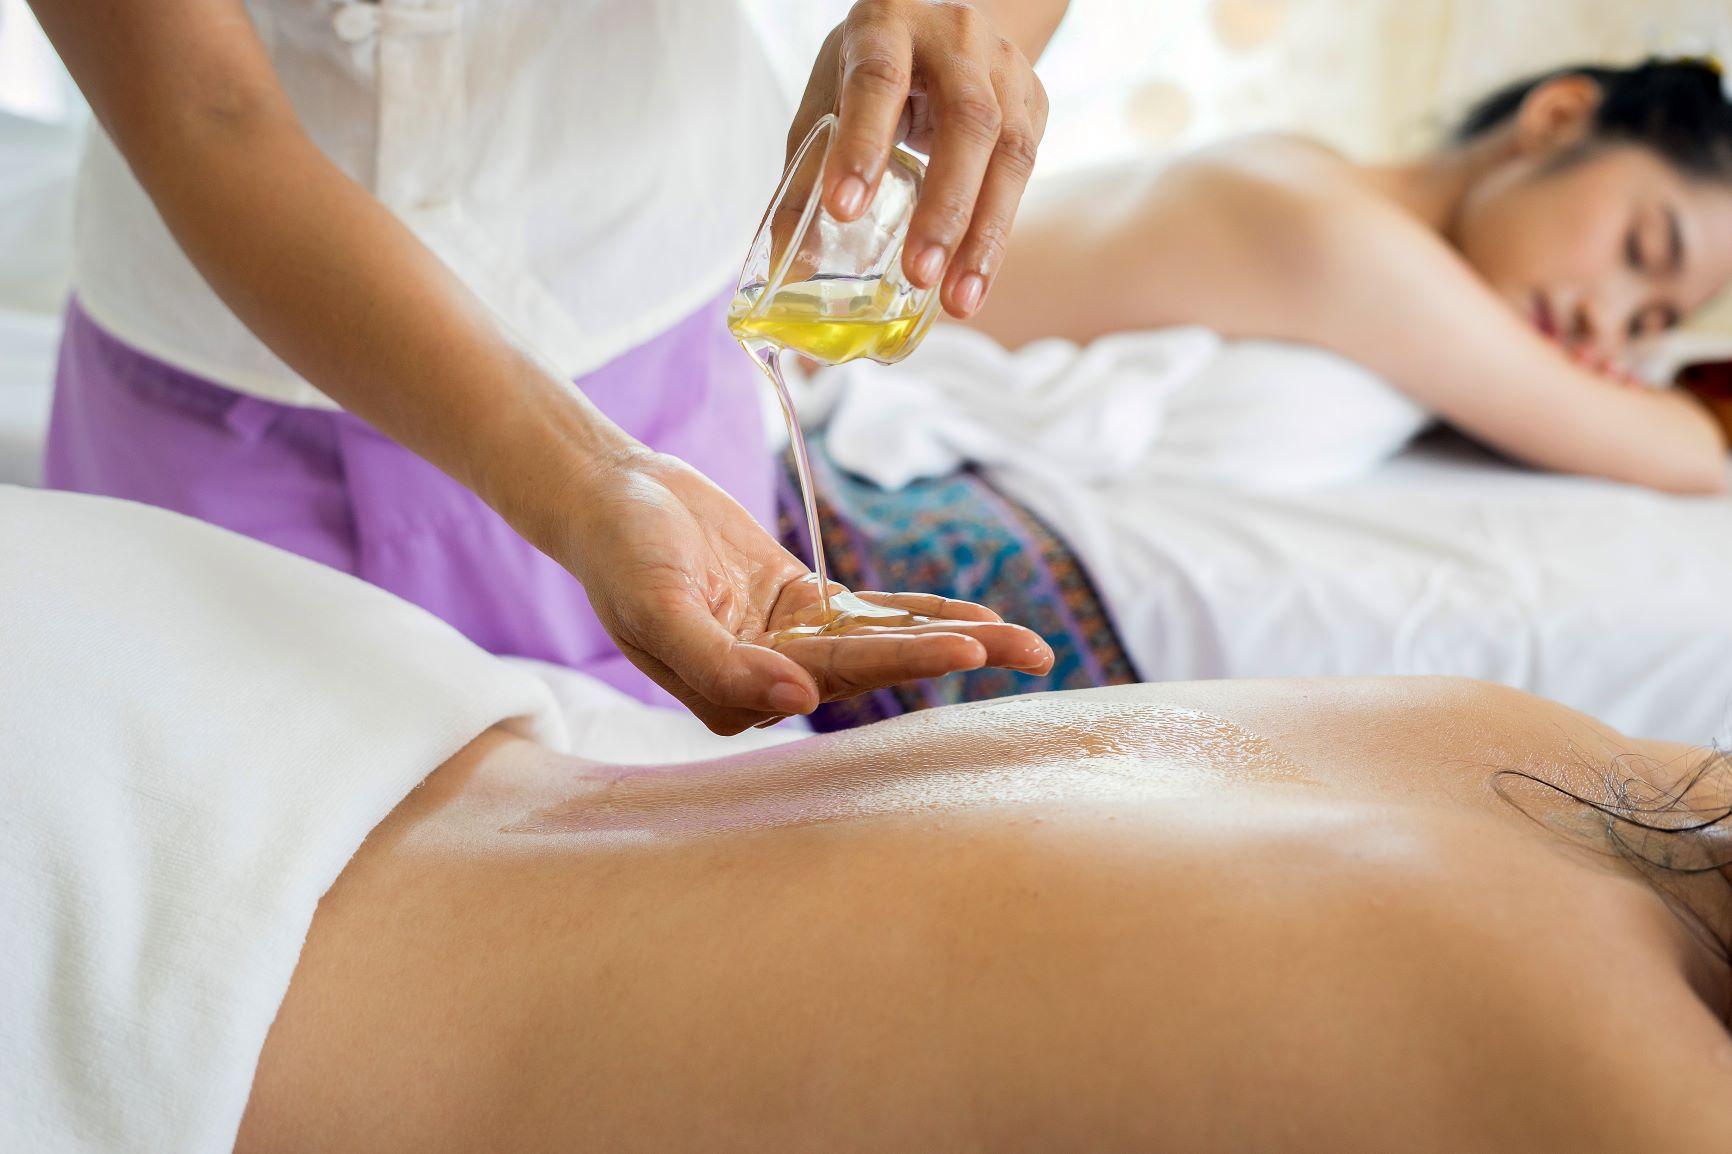 Lichaamsbehandeling opleiding Body Treatment